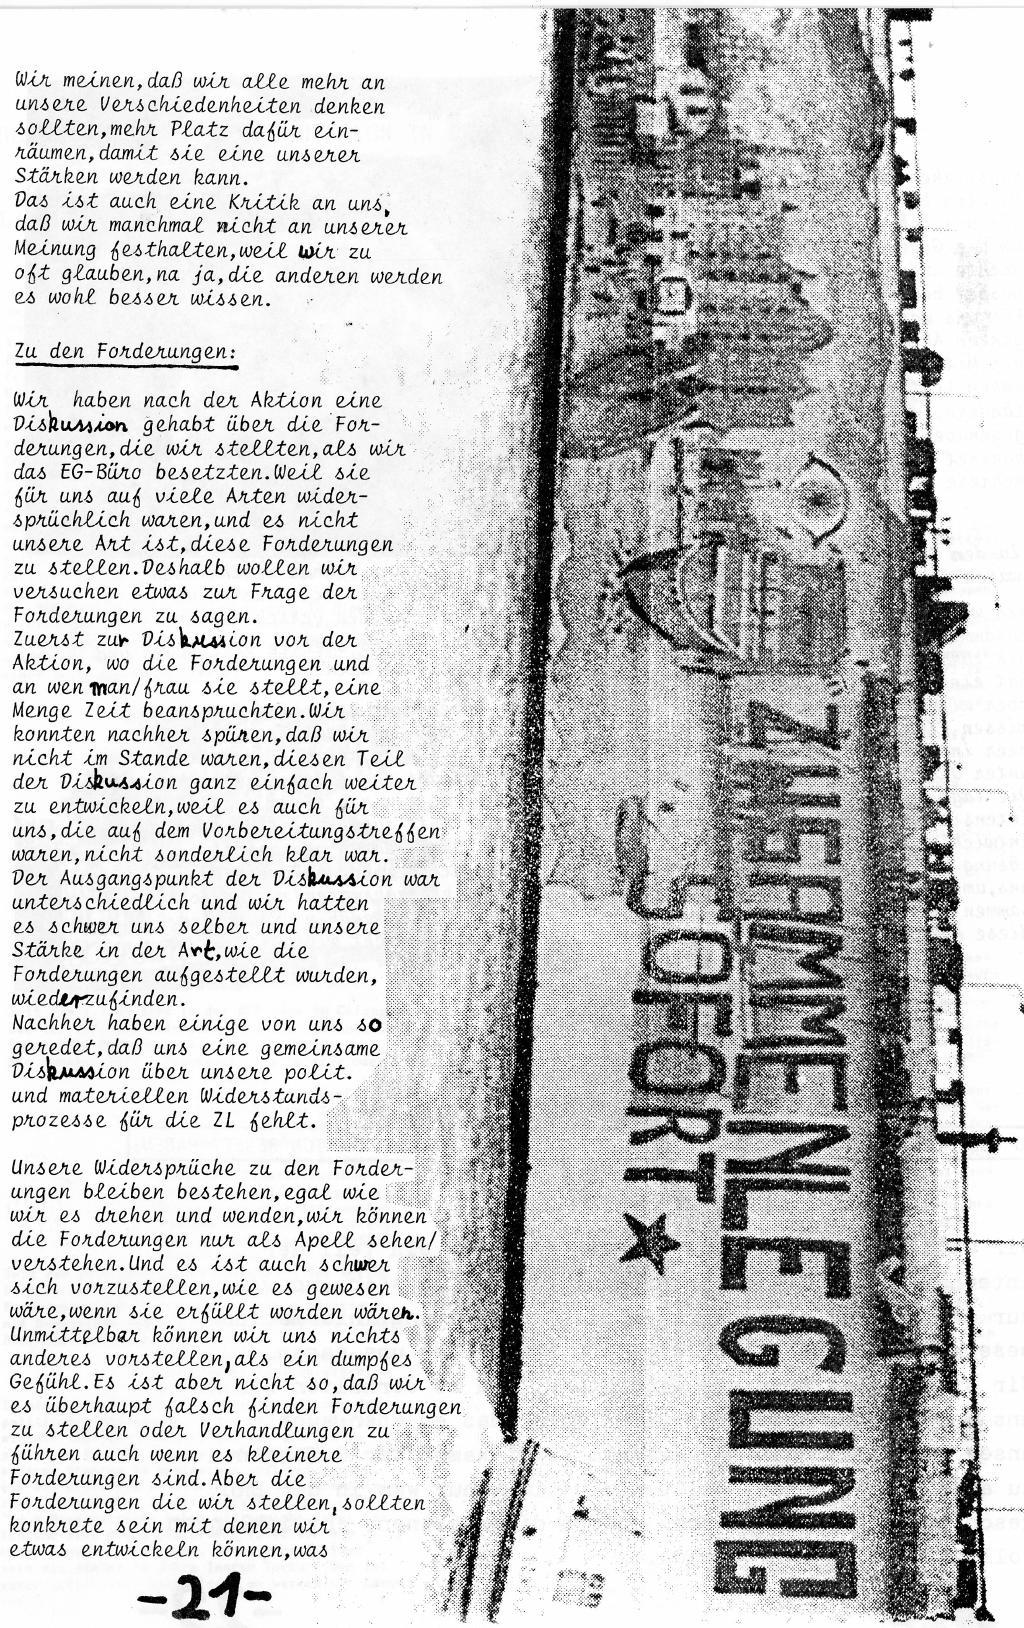 Belgien_Doku_Besetzung_EG_Kommission_1989_023